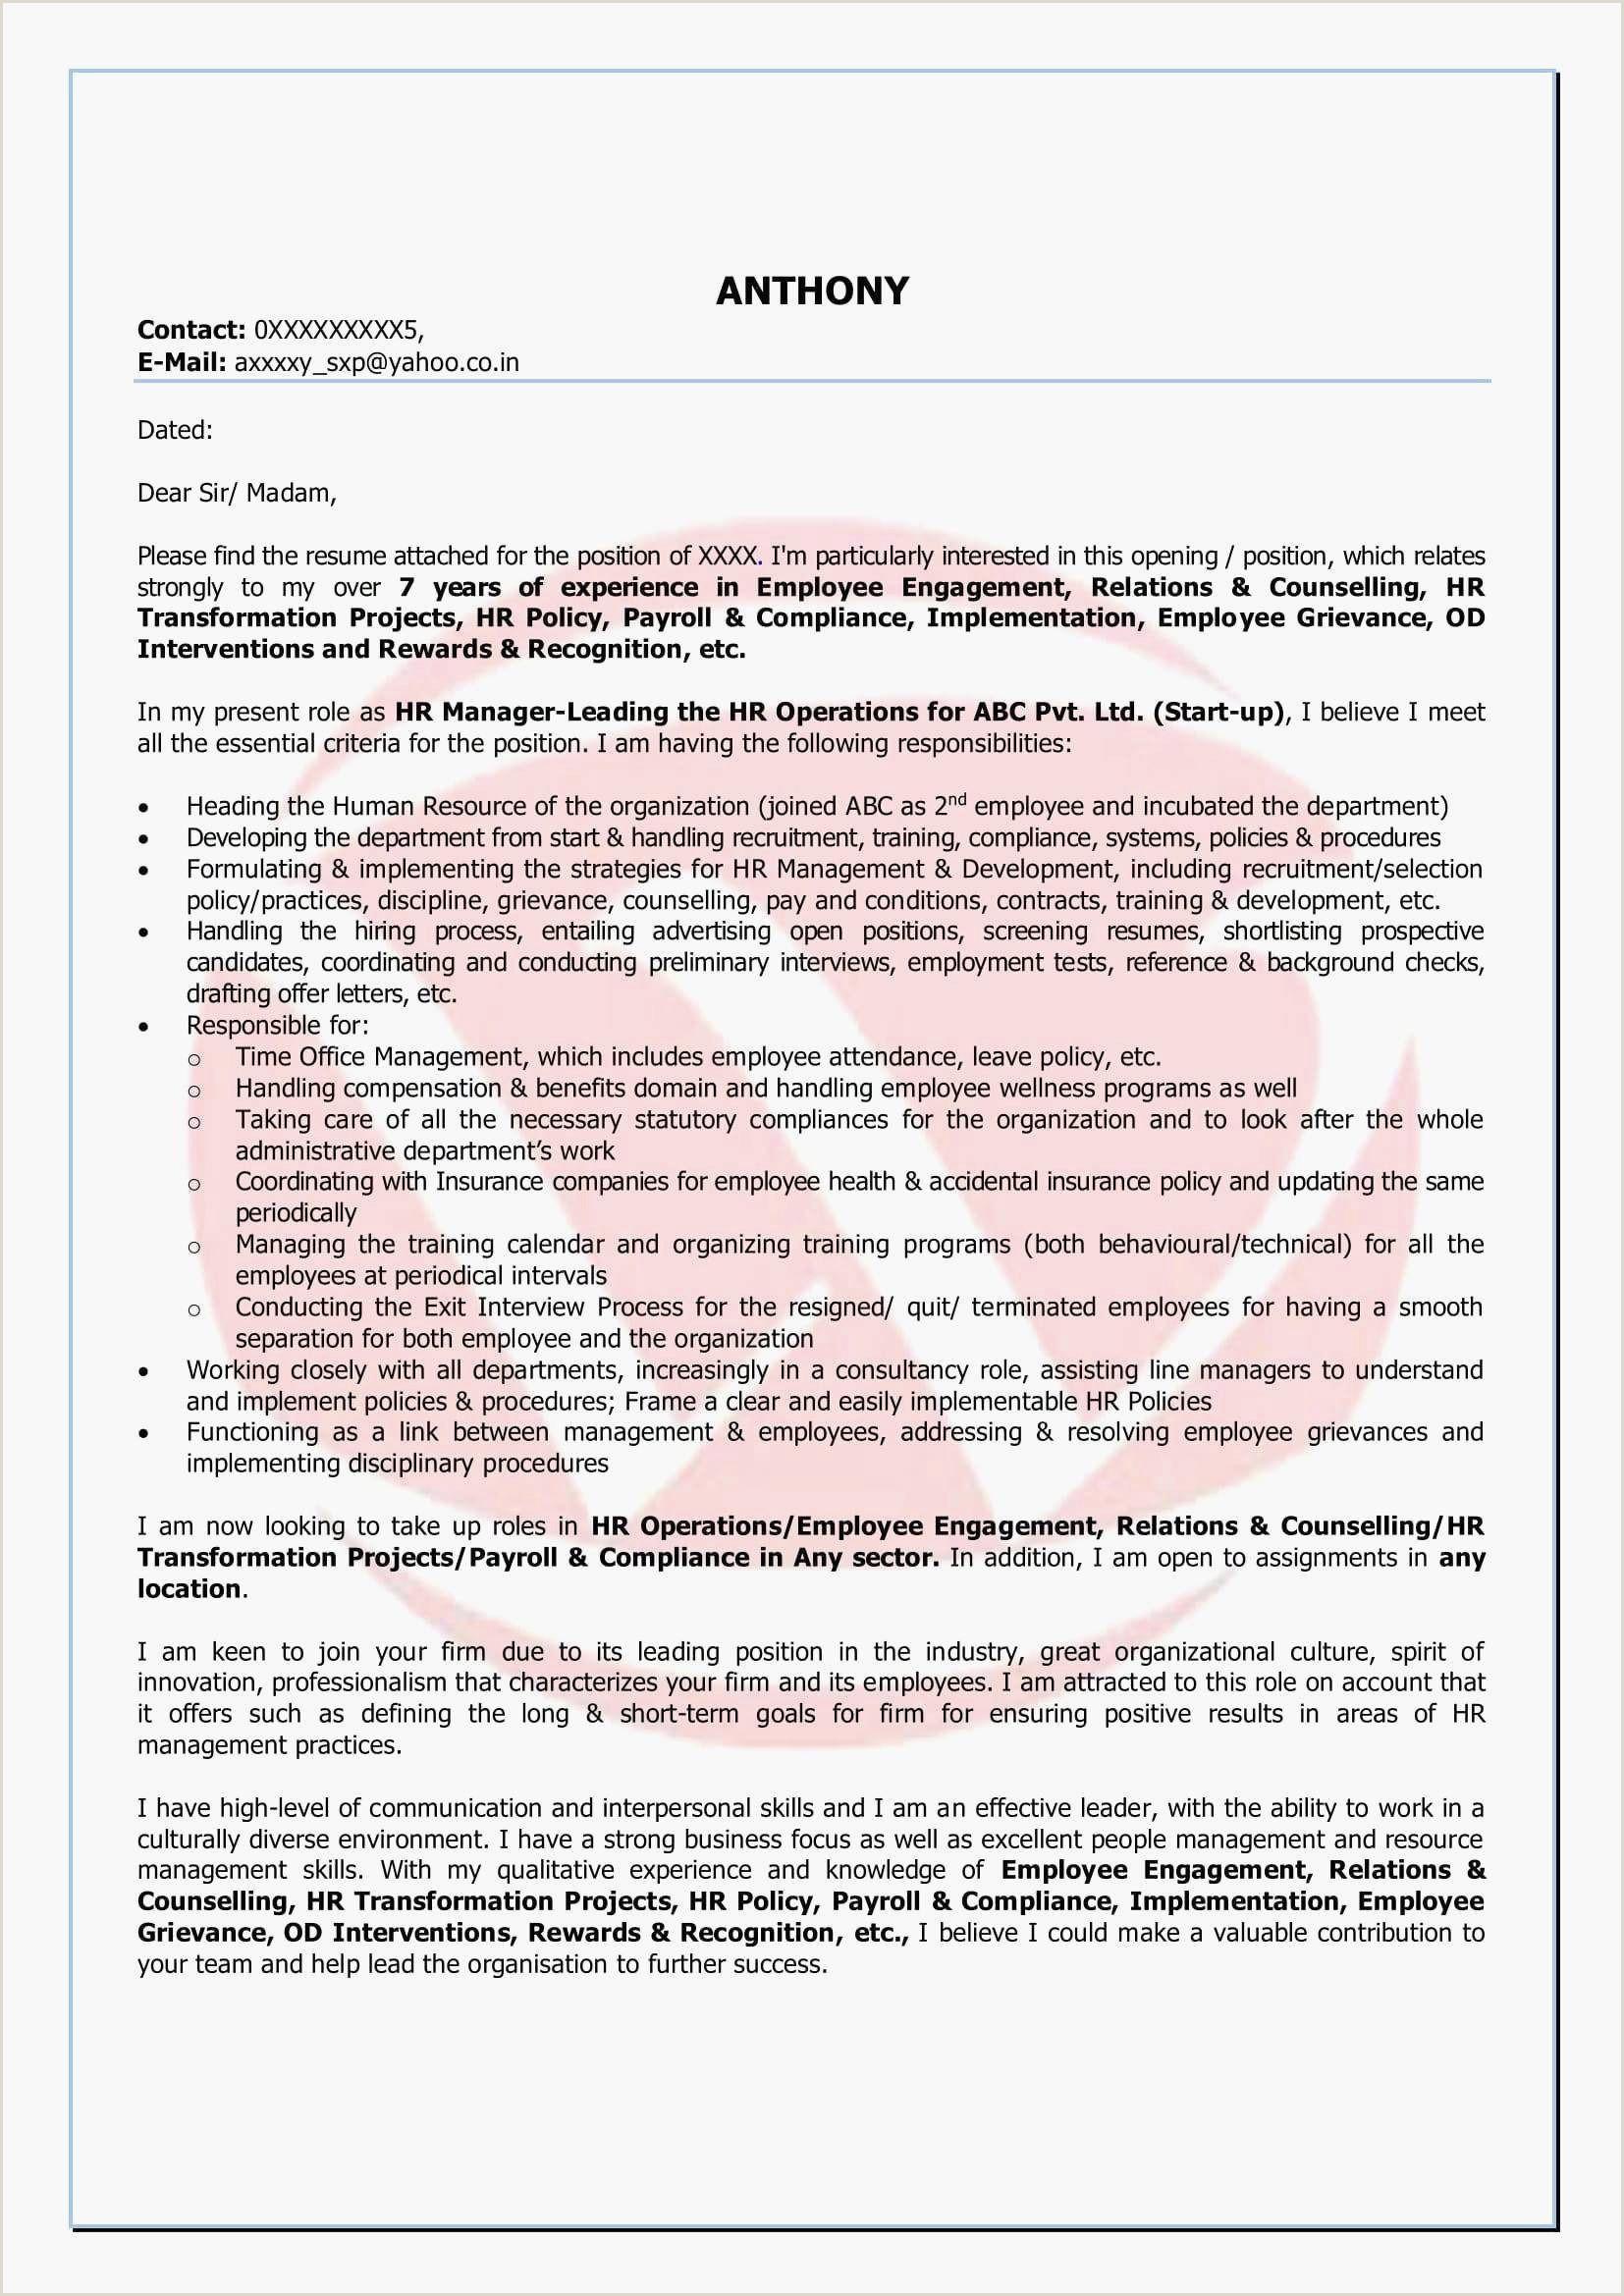 Resume Format For Job Hd Exemple De Cv Cuisinier Modele De Cv Cuisinier Agréable